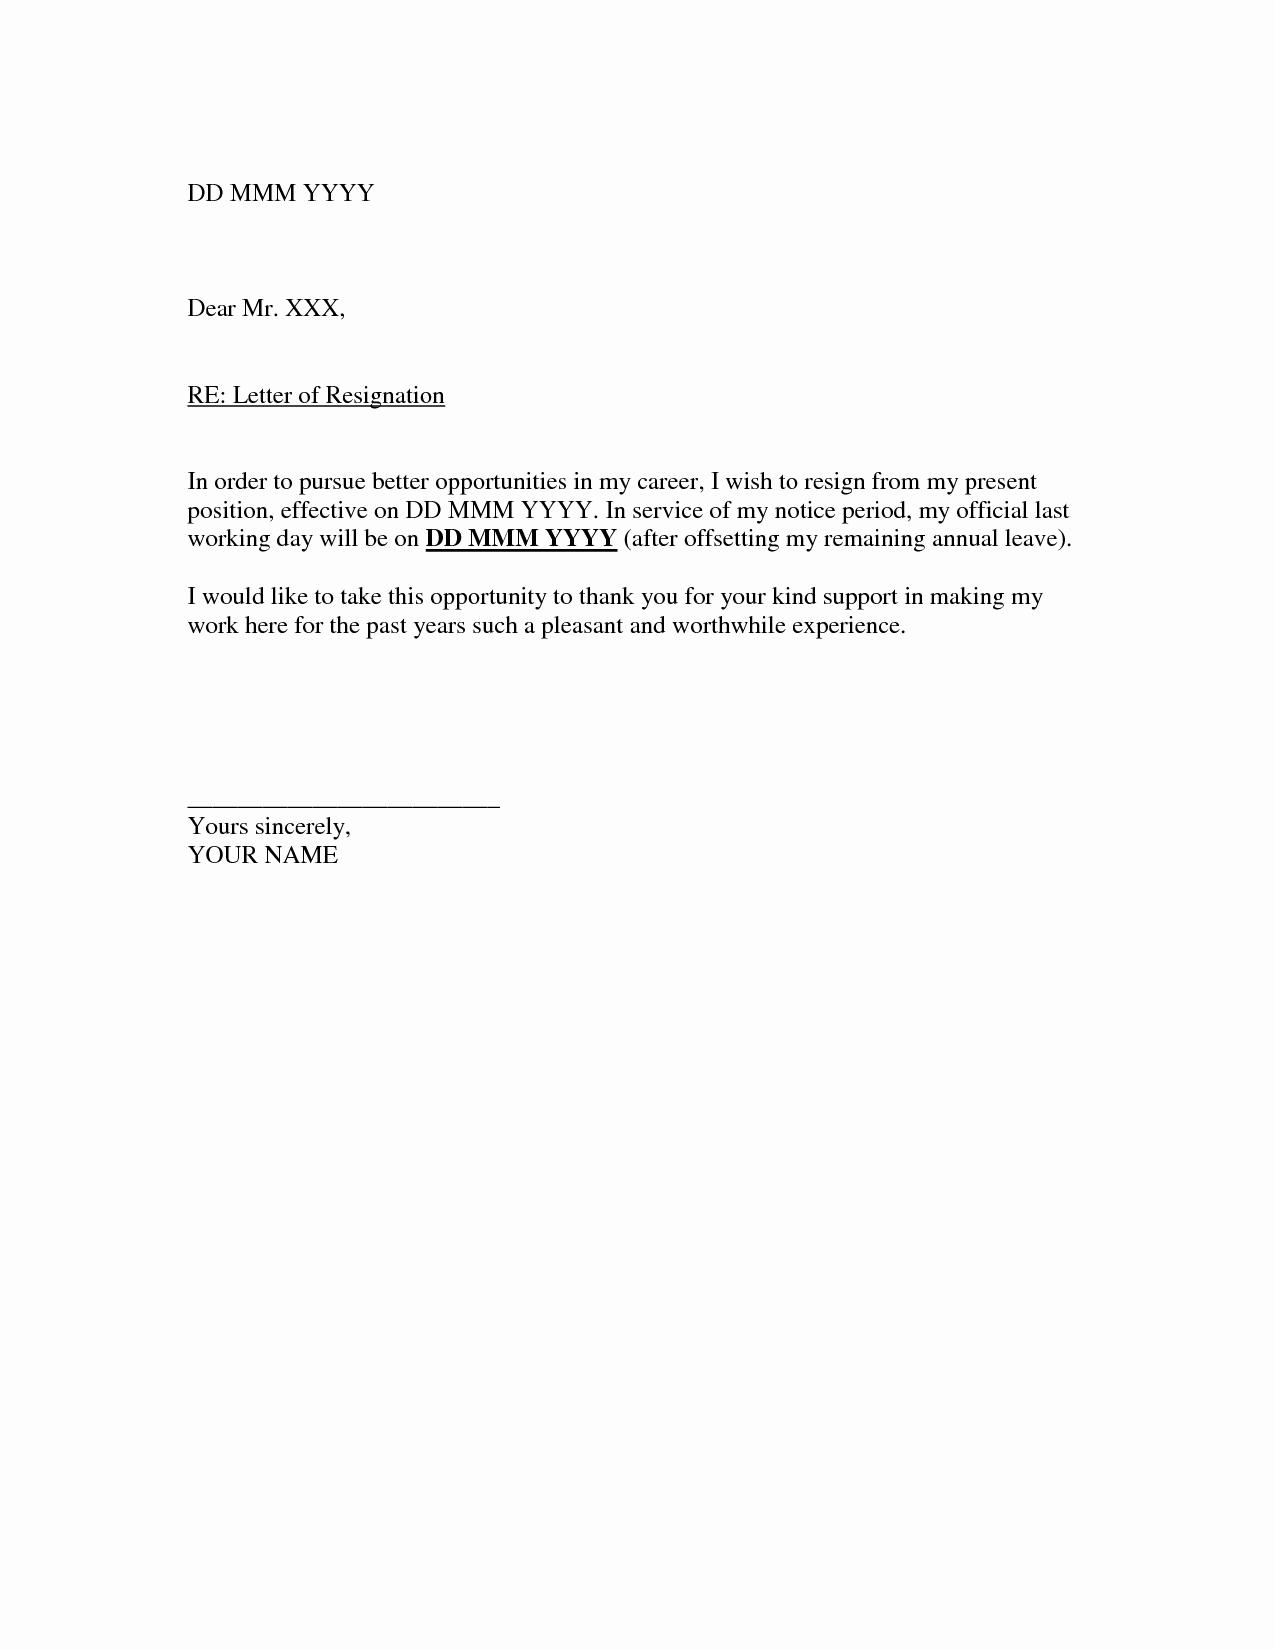 Resignation Letter Template Free Unique Printable Sample Letter Of Resignation form